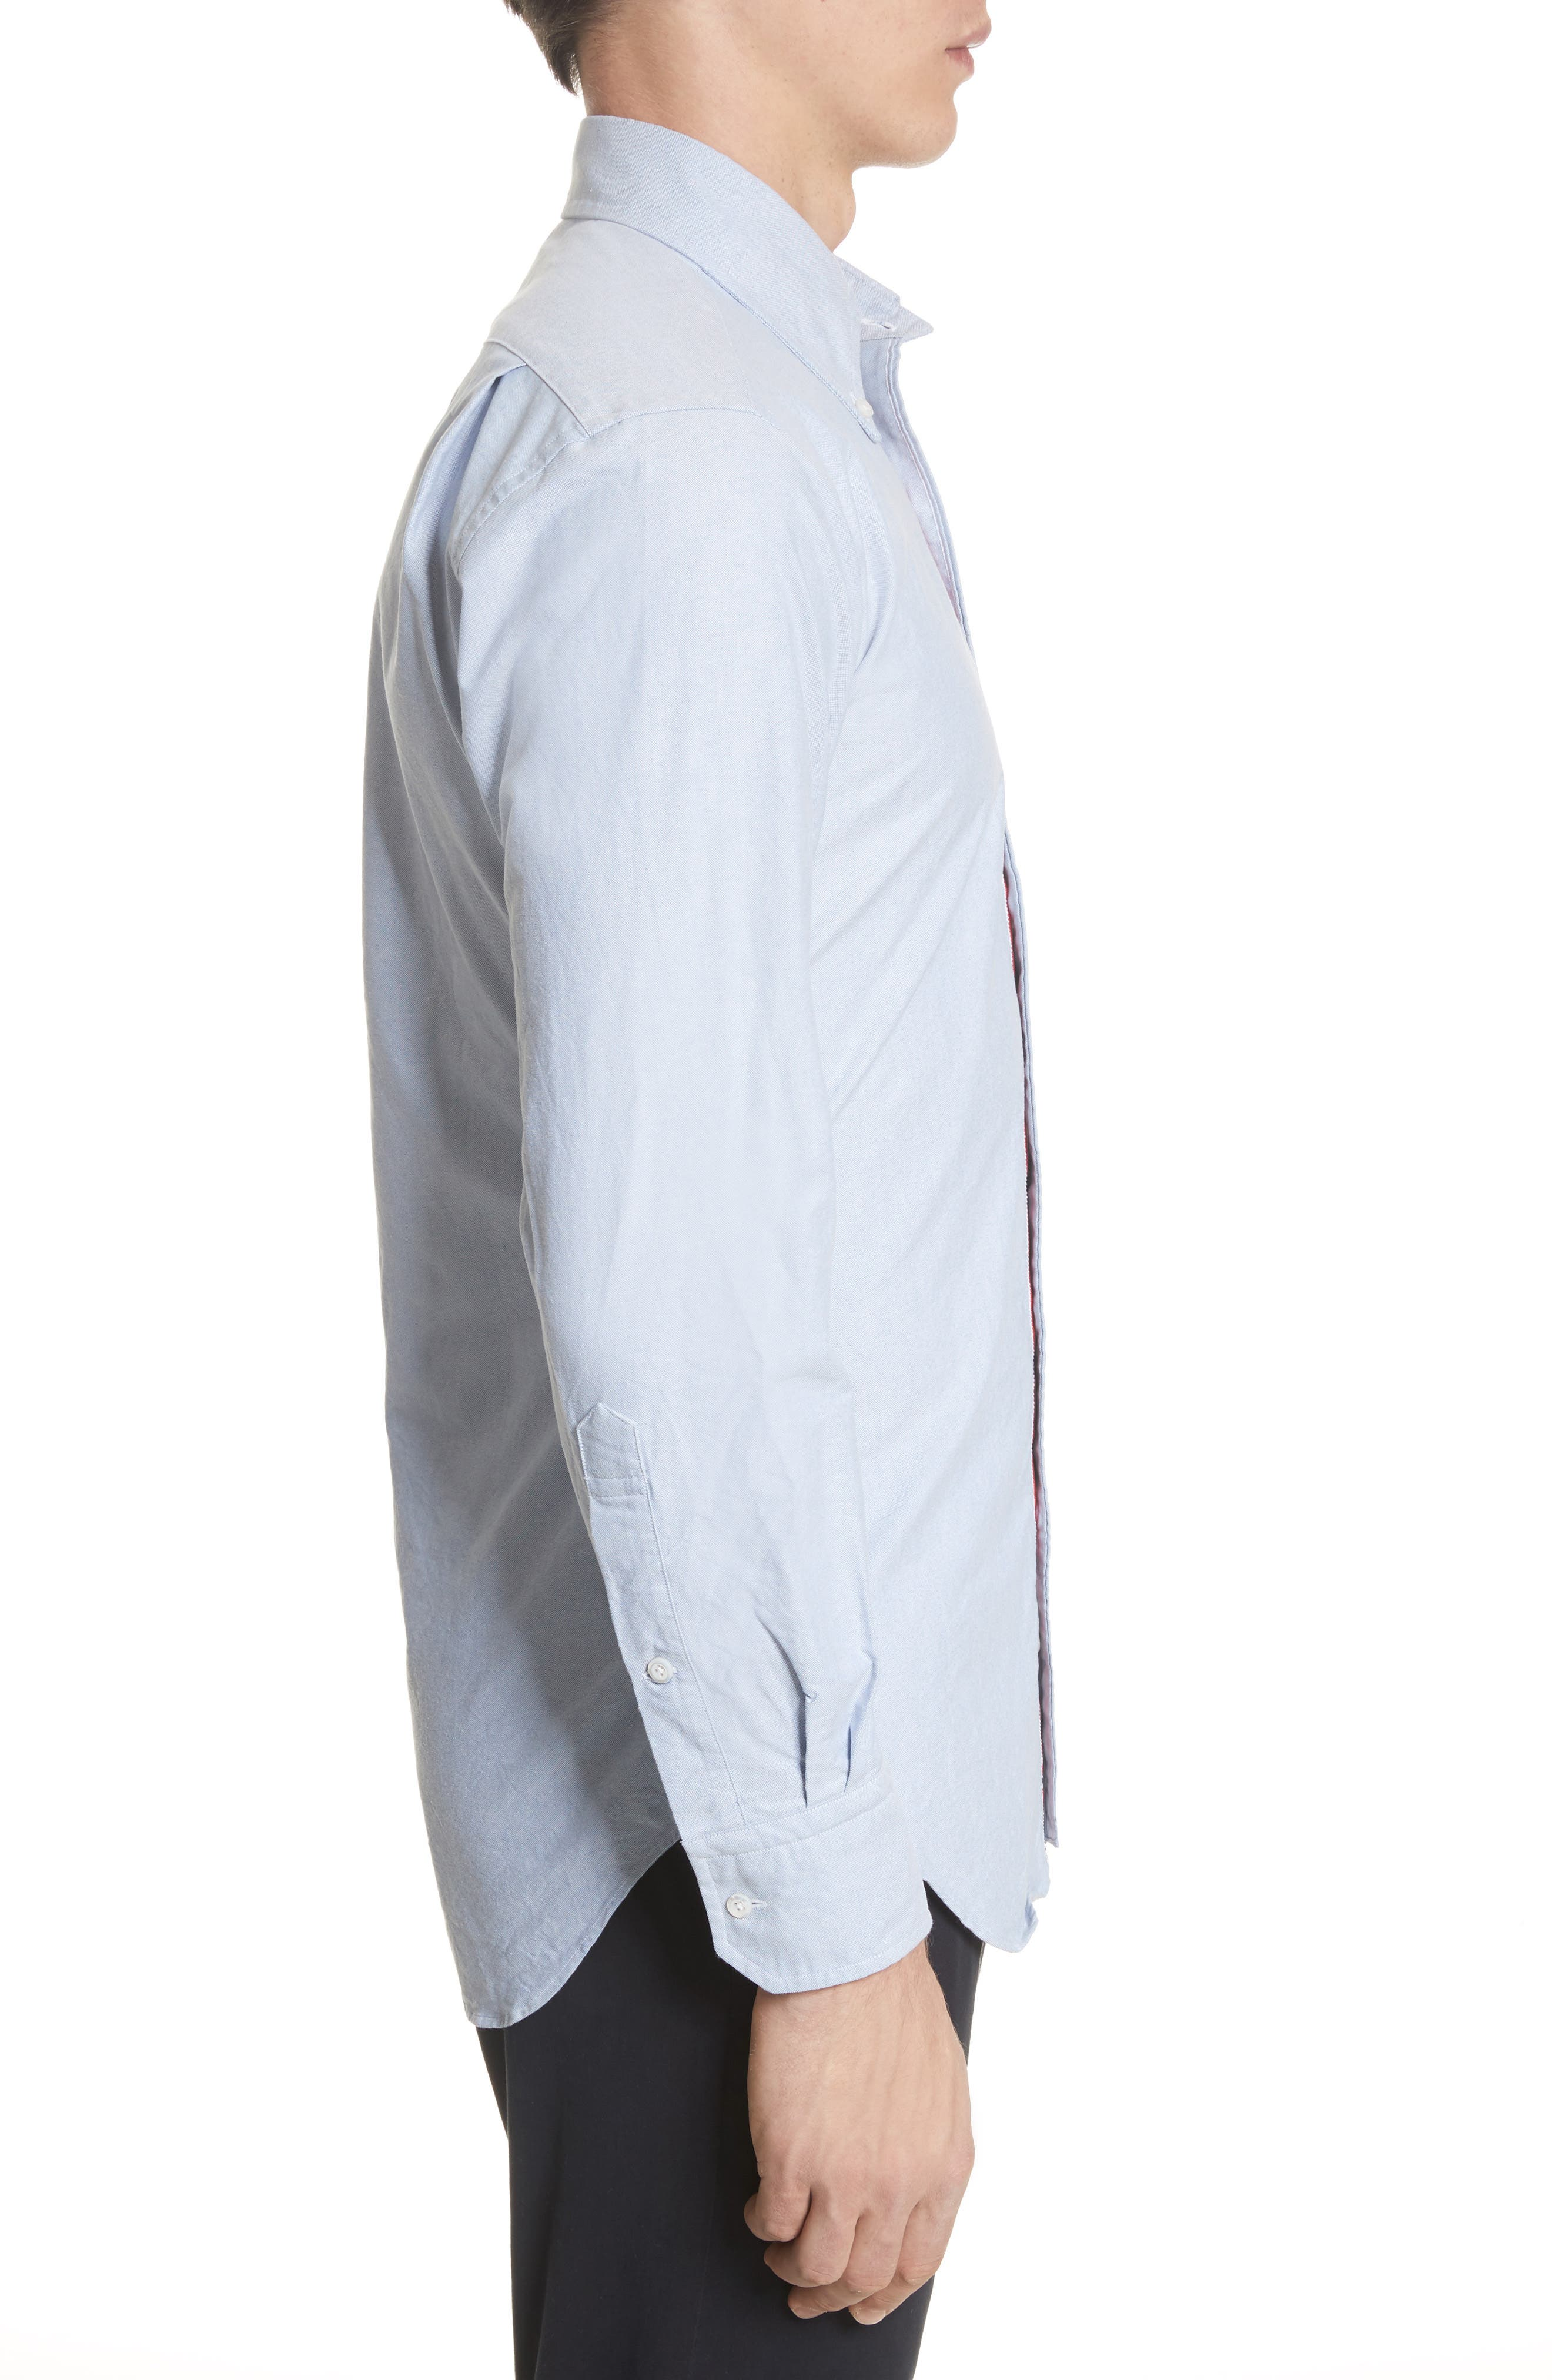 Extra Trim Fit Oxford Shirt with Grosgrain Trim,                             Alternate thumbnail 4, color,                             LIGHT BLUE